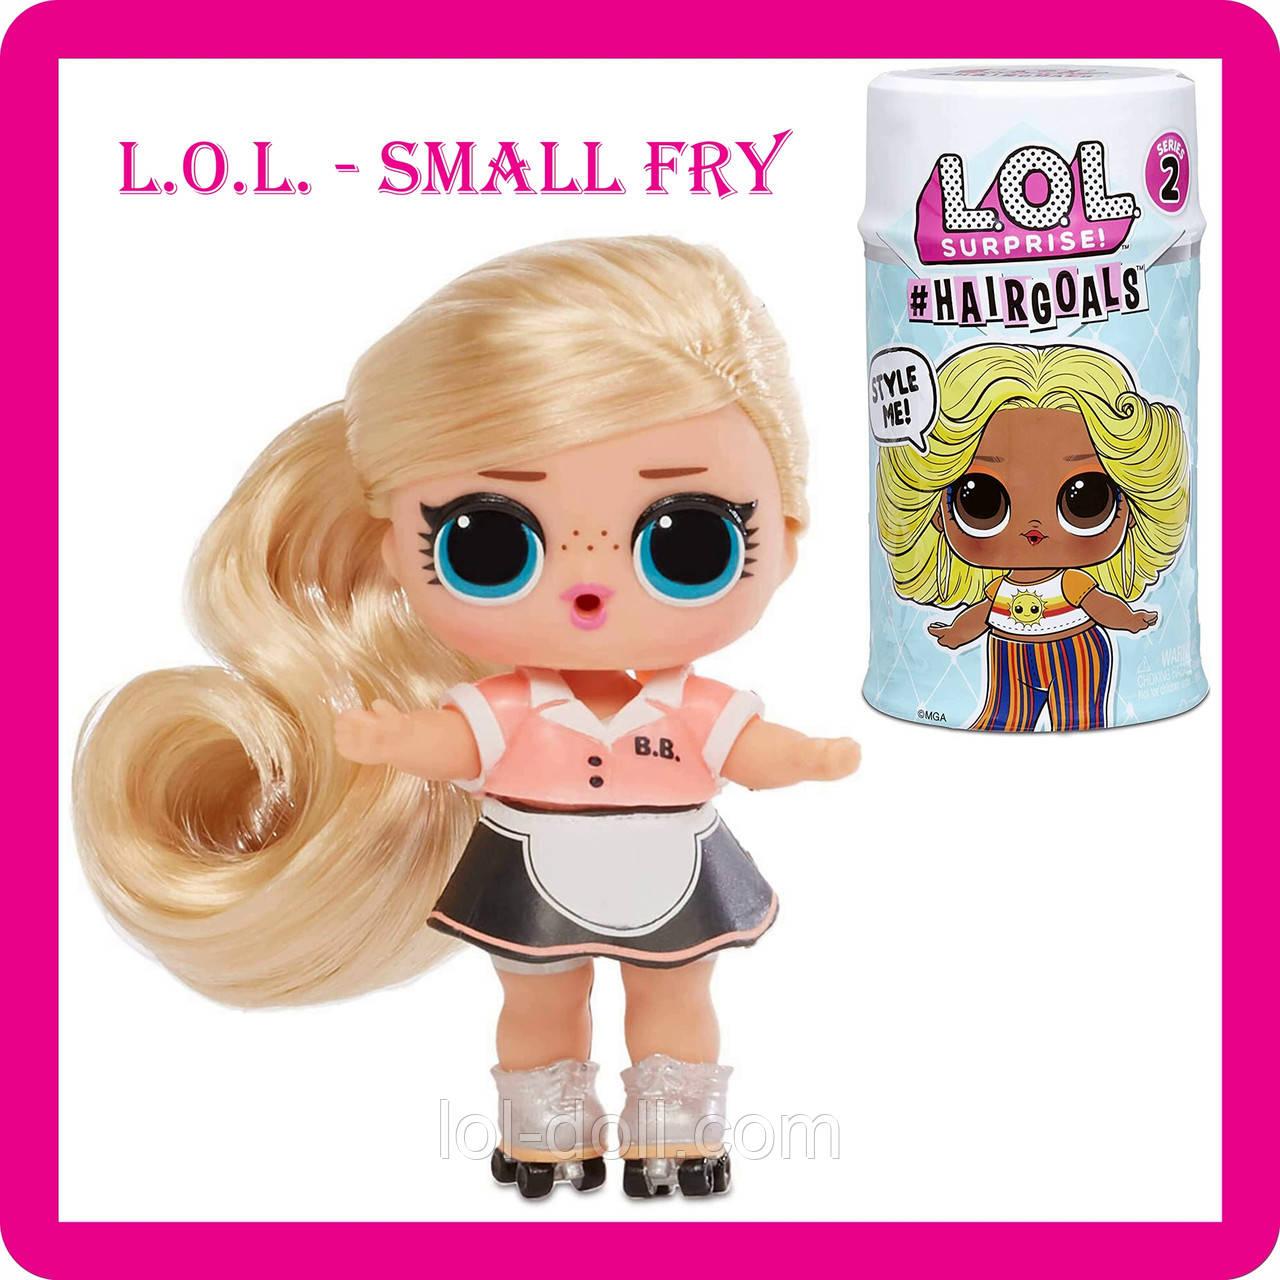 Кукла ЛОЛ Small Fry LOL Surprise Оригинал Hairgoals 2 серия Хеиргоалс